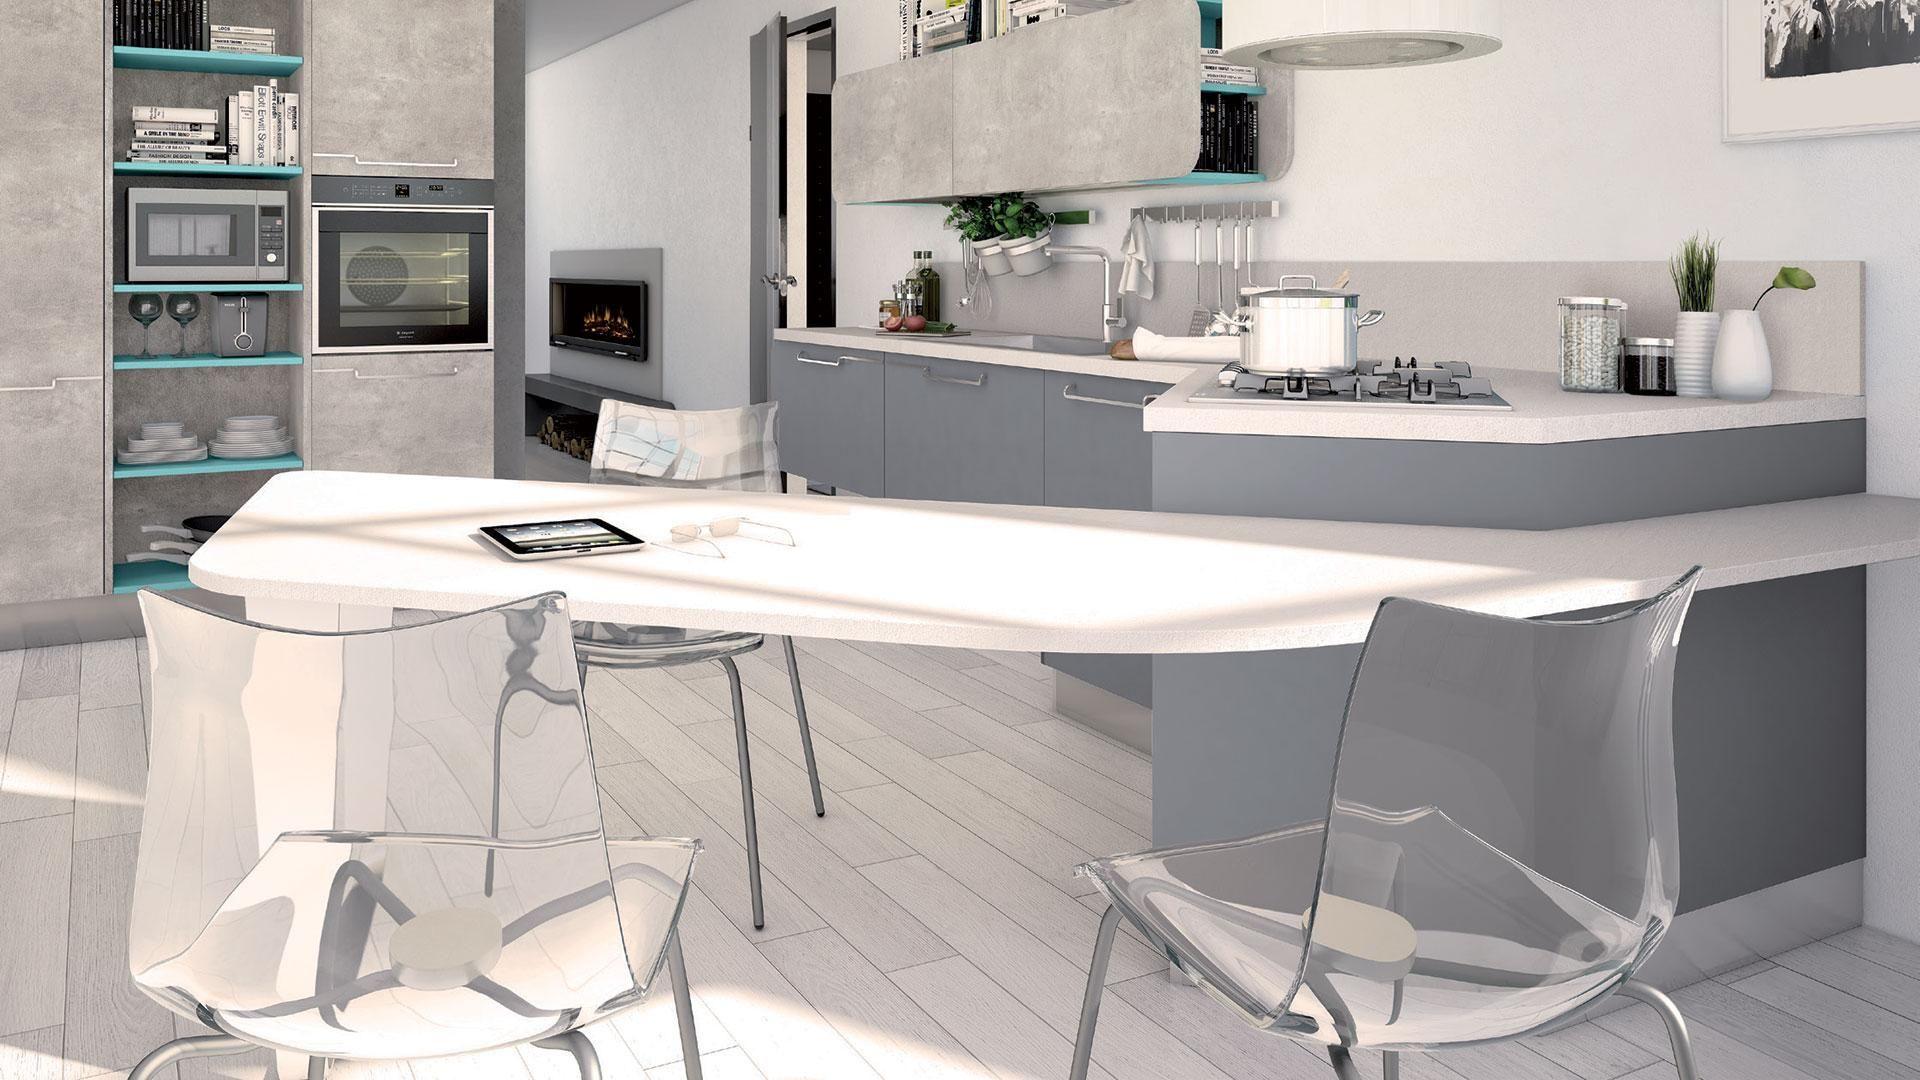 top - cucine lube | idee per la casa | pinterest | tops - Top Cucine Lube